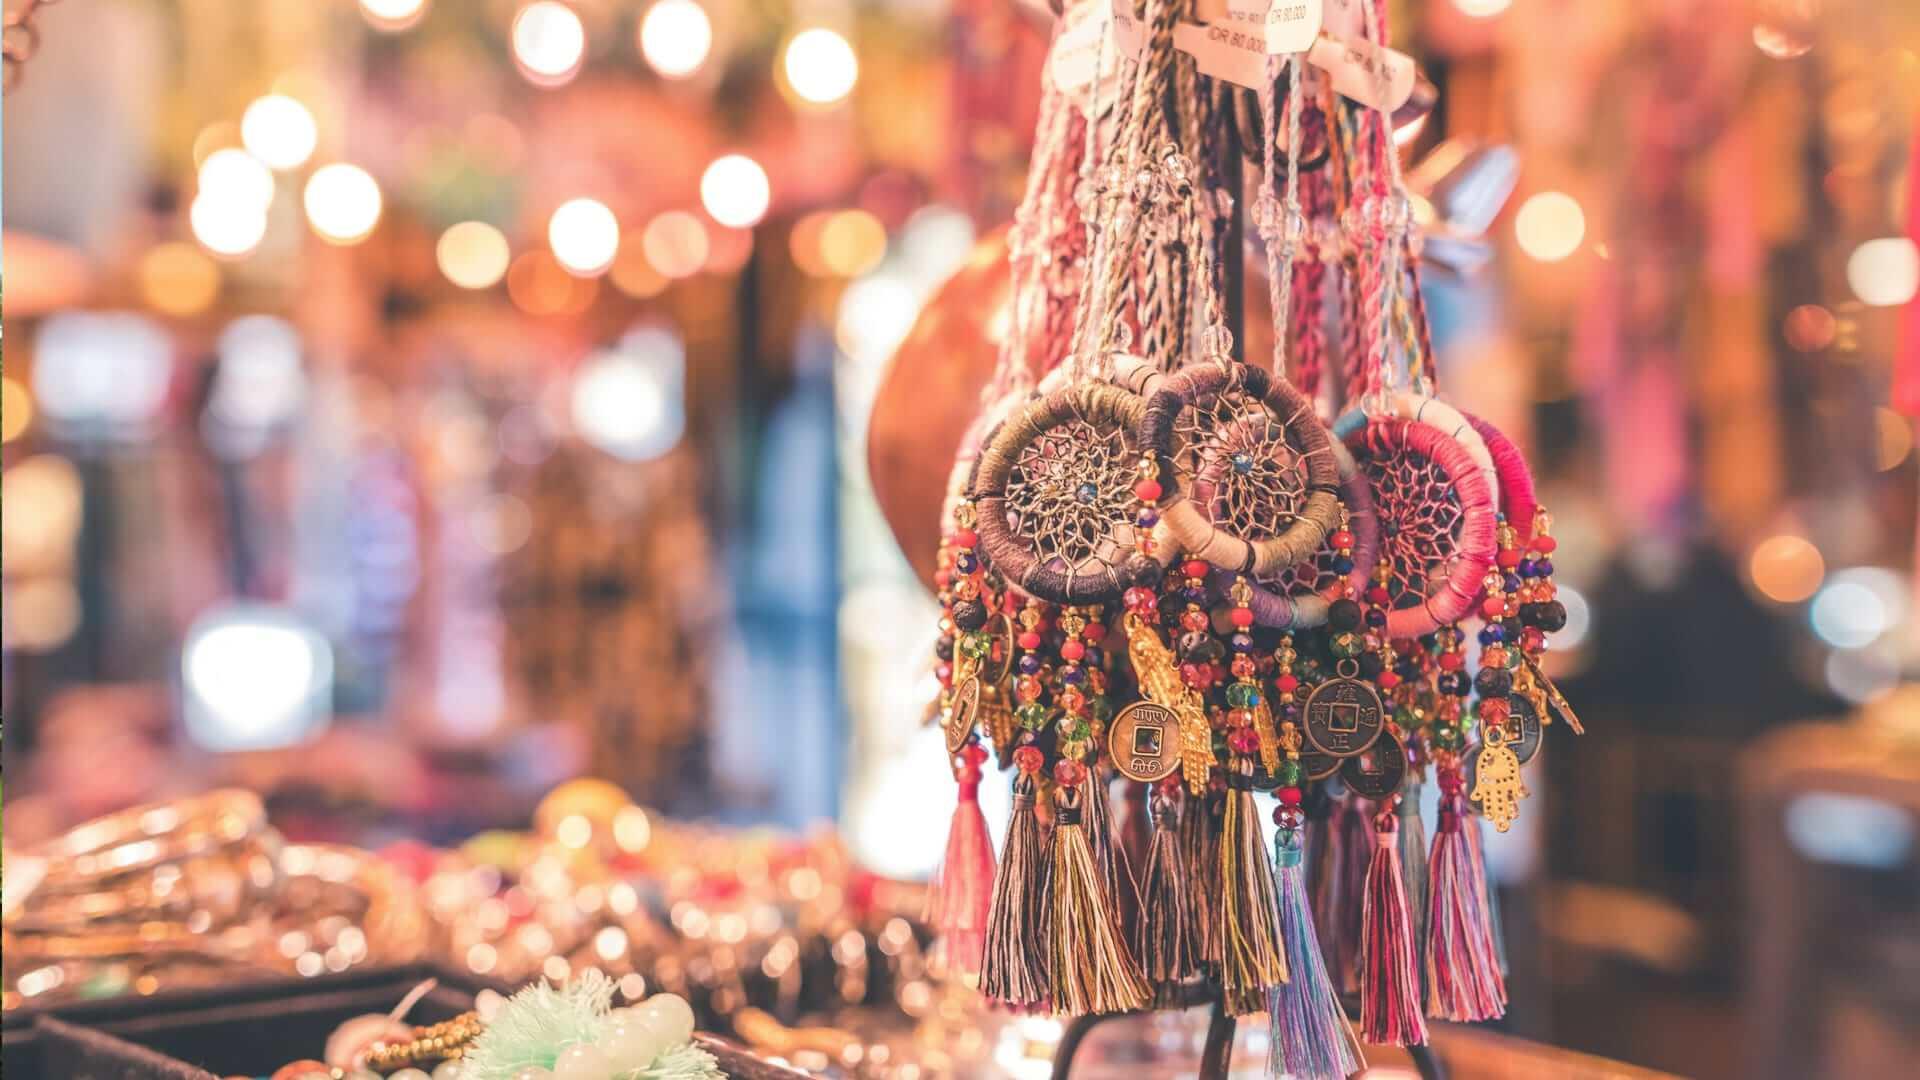 Handmade dreamcatchers and jewellery in Bali.